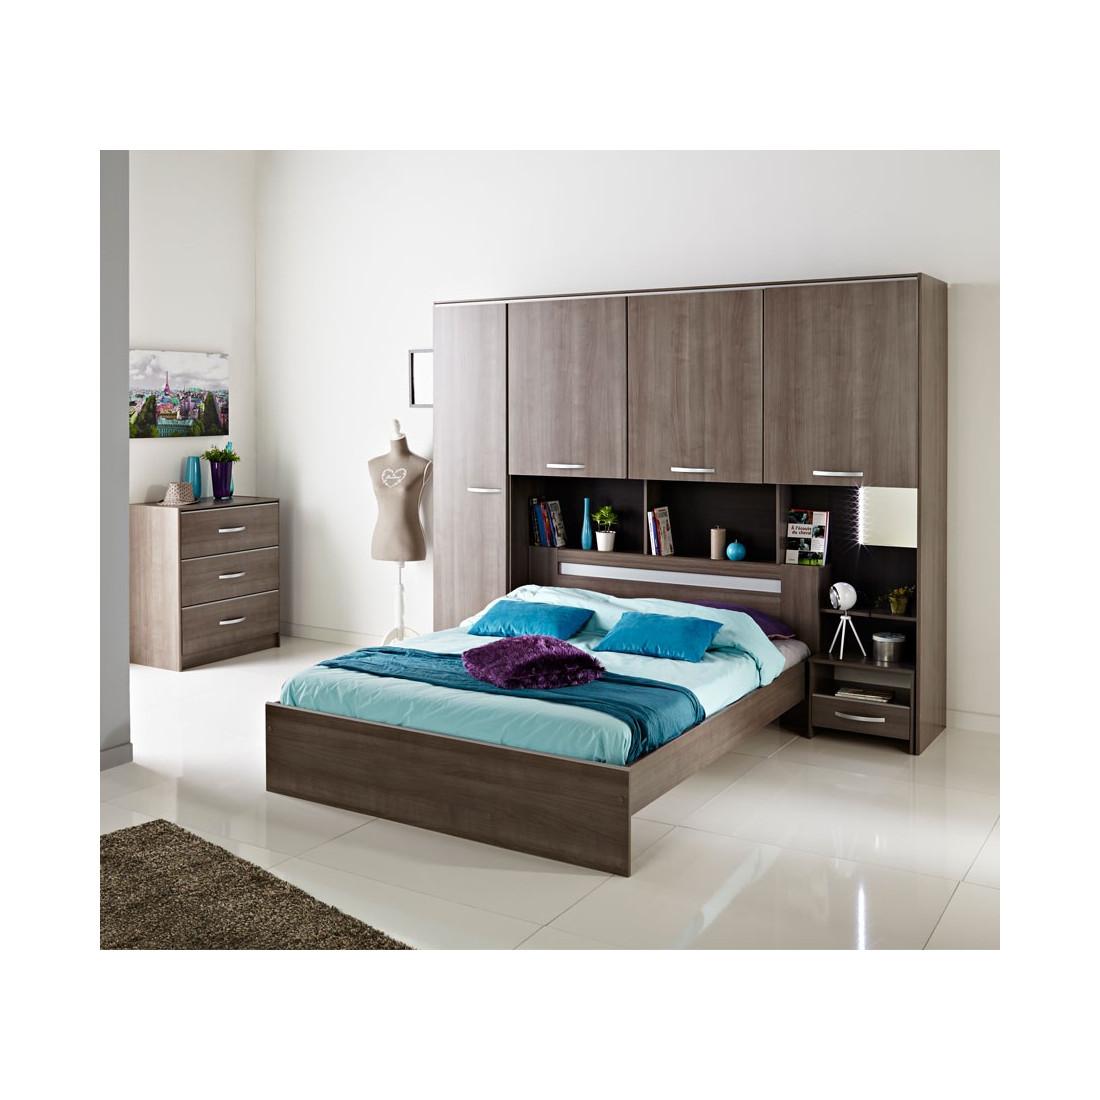 cadre de lit t te de lit 140 190 evy univers de la chambre. Black Bedroom Furniture Sets. Home Design Ideas